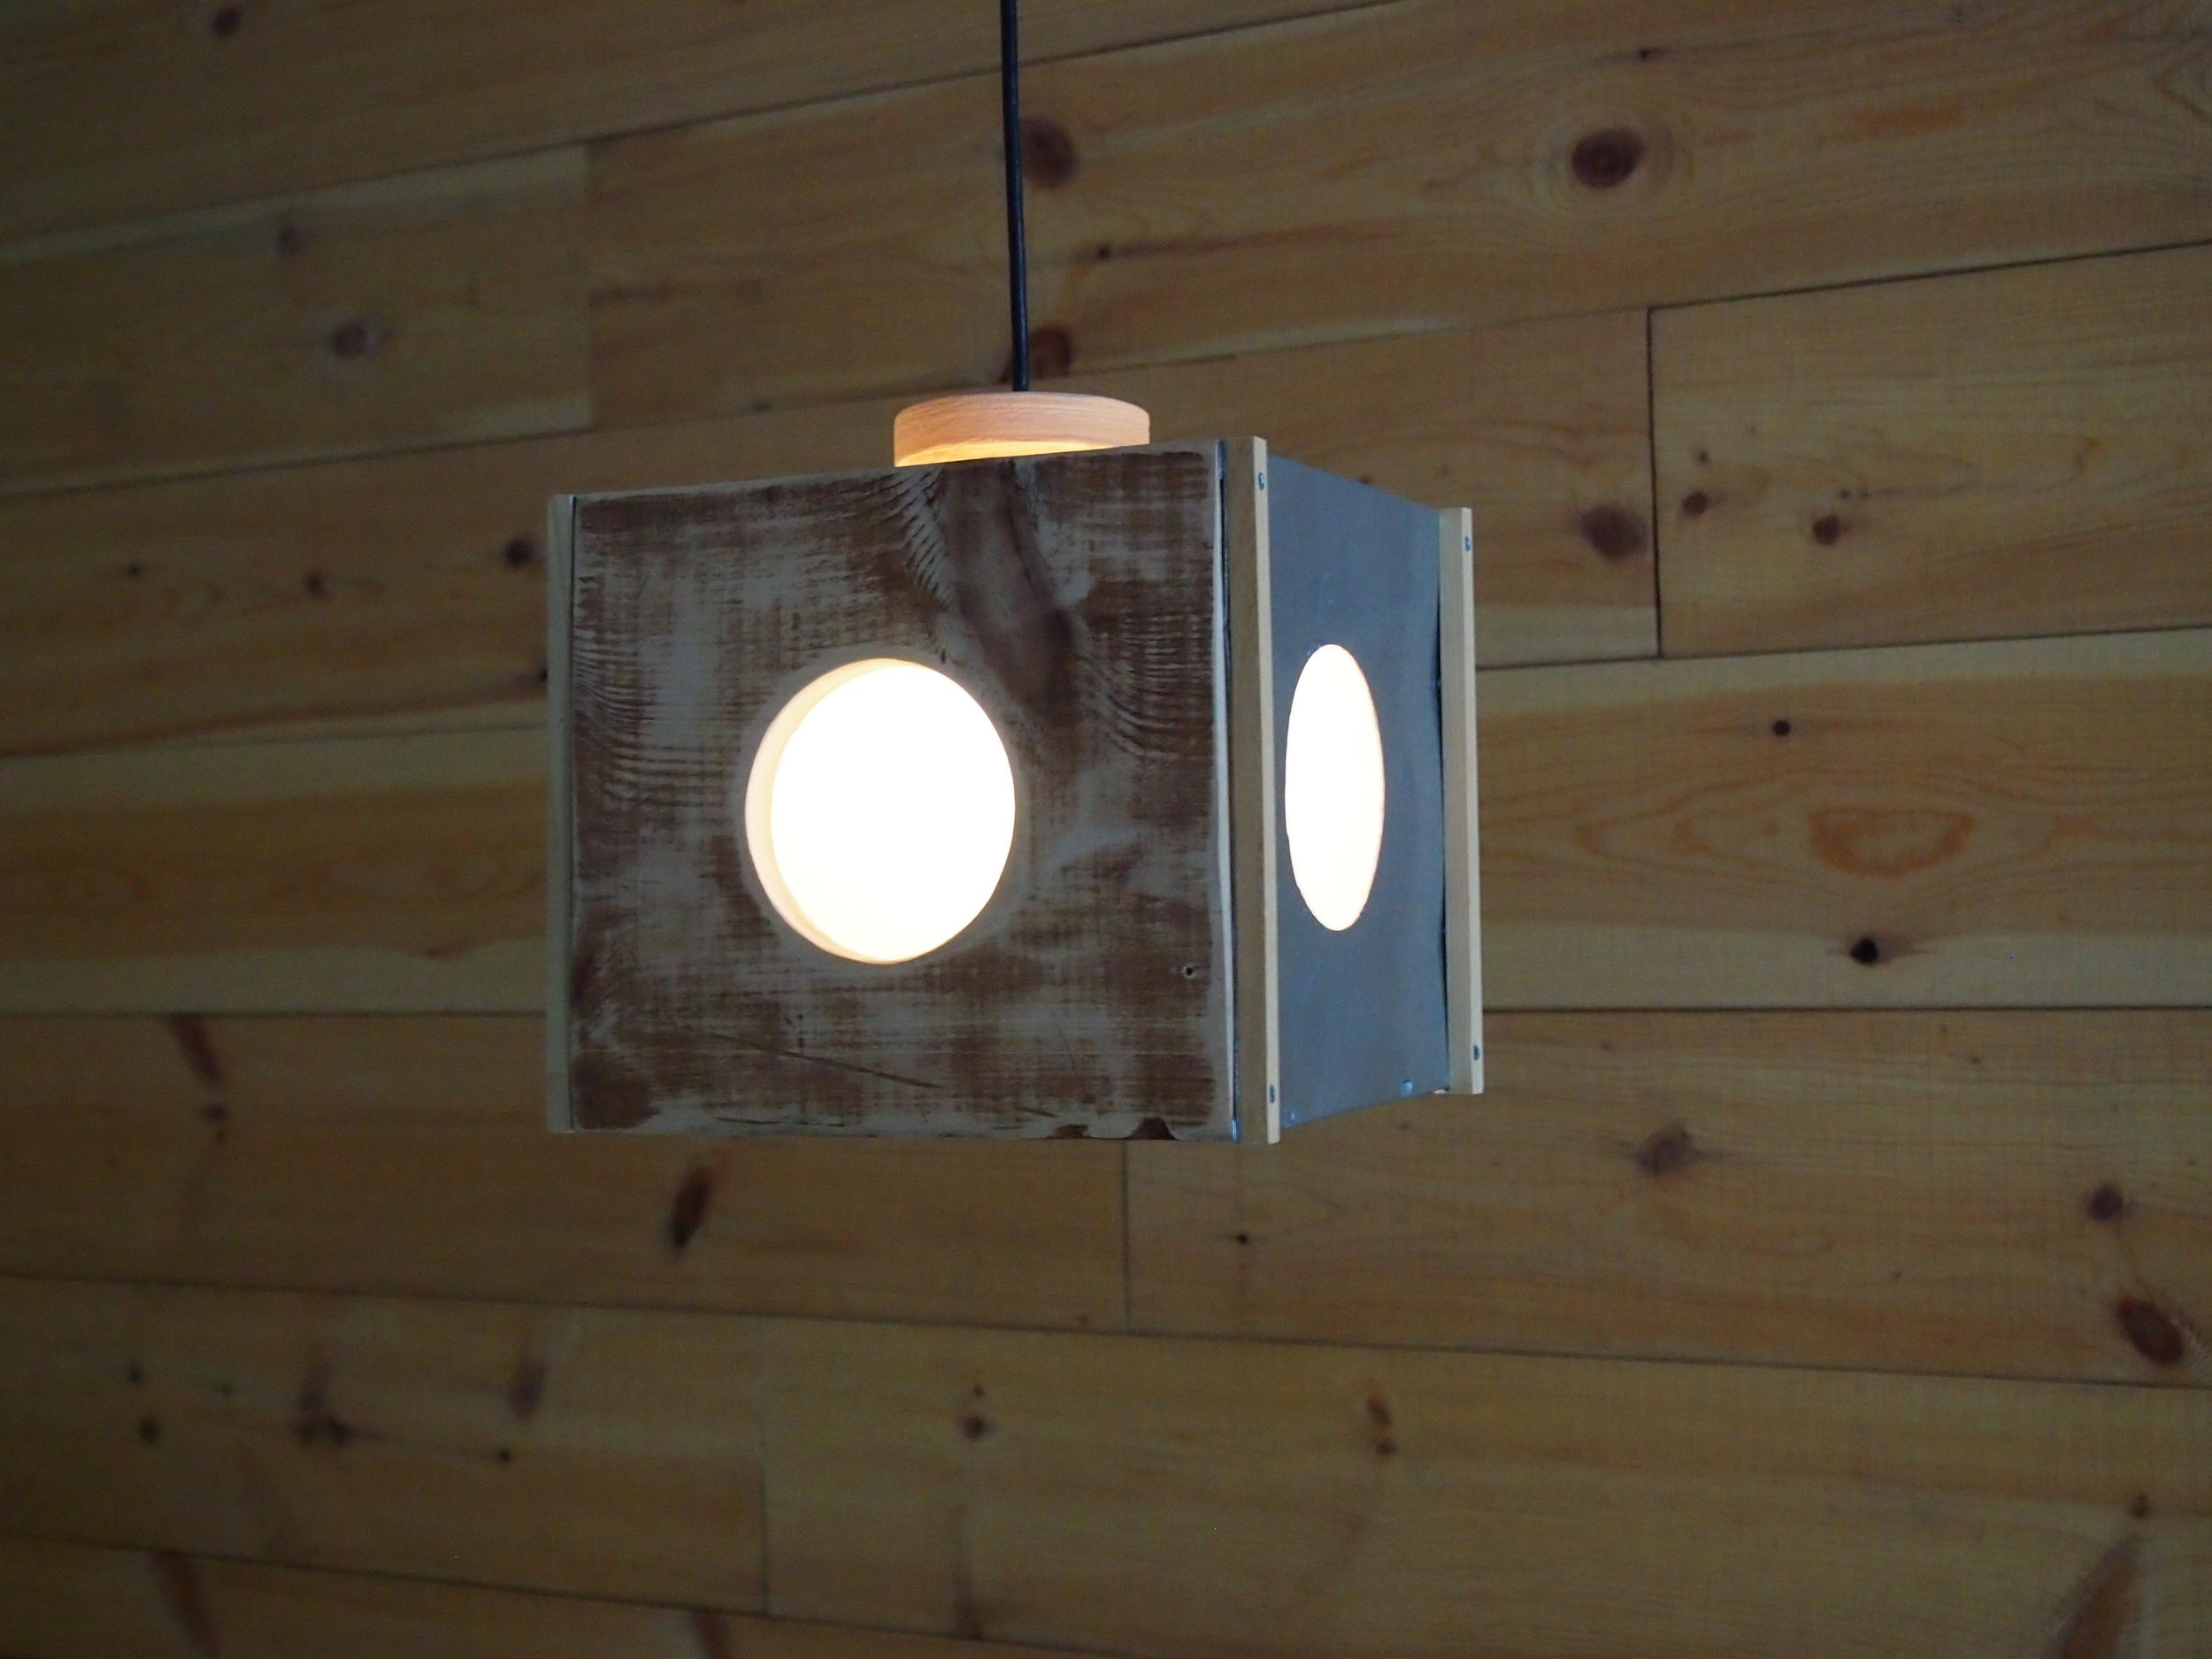 Duct light